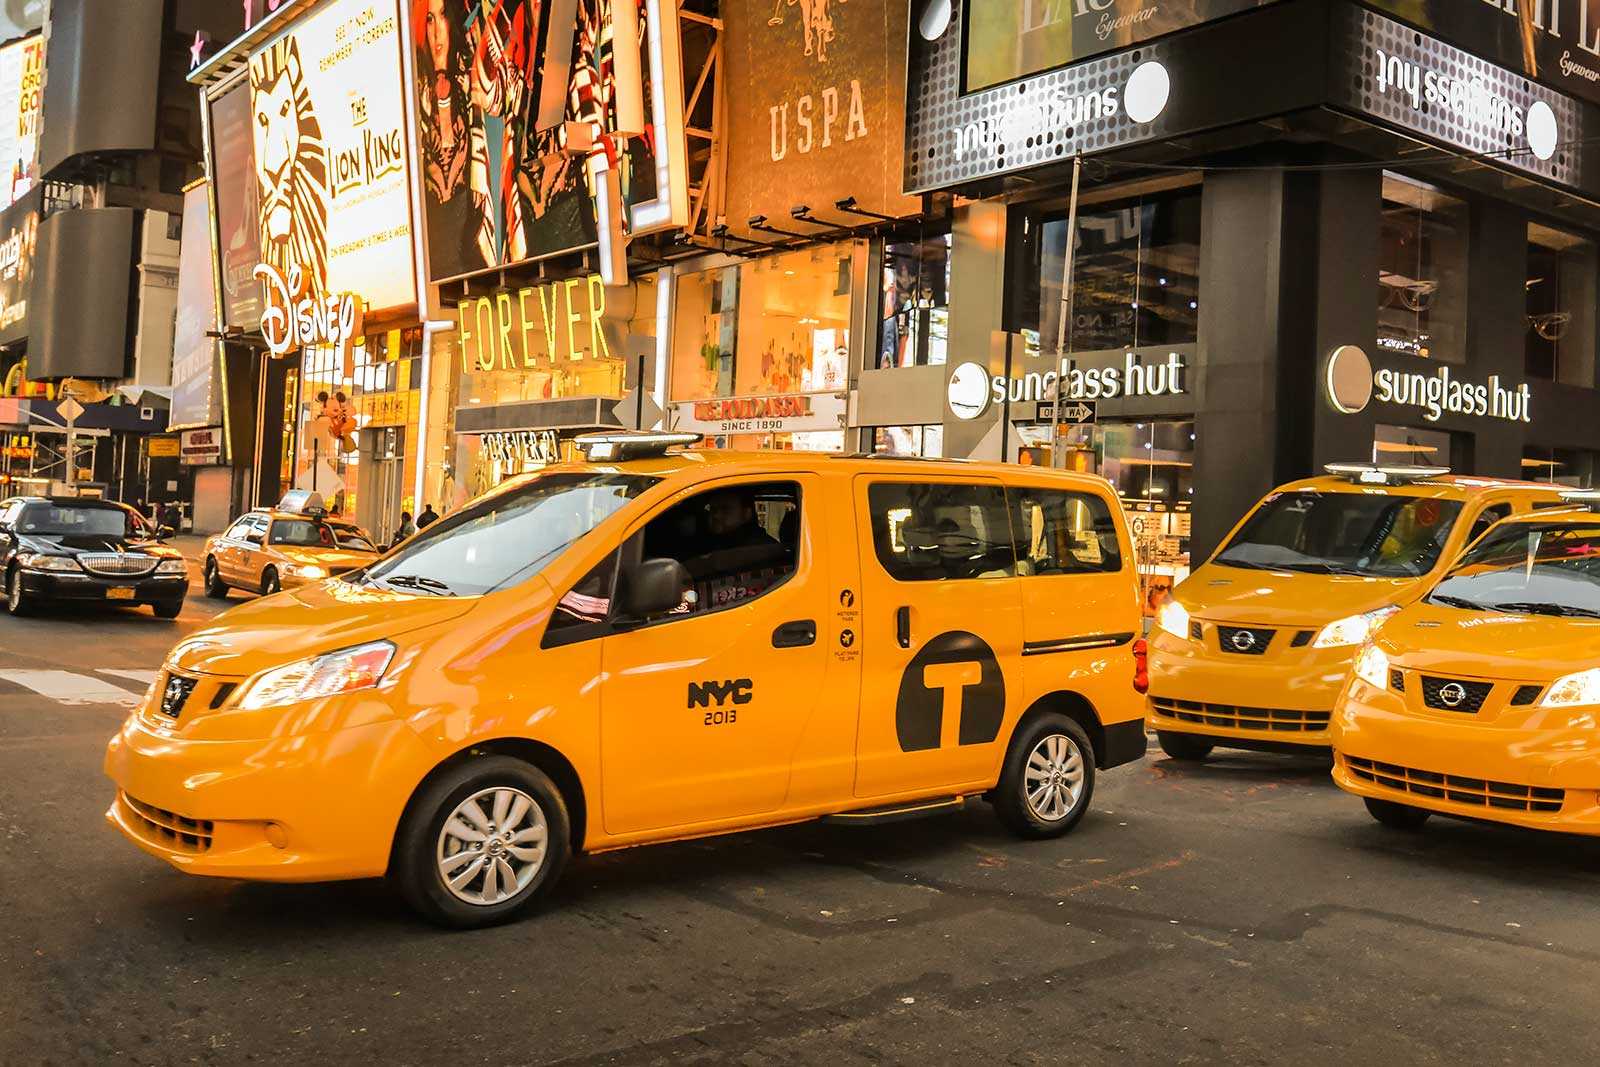 Wheelchair taxi van on New York City street.